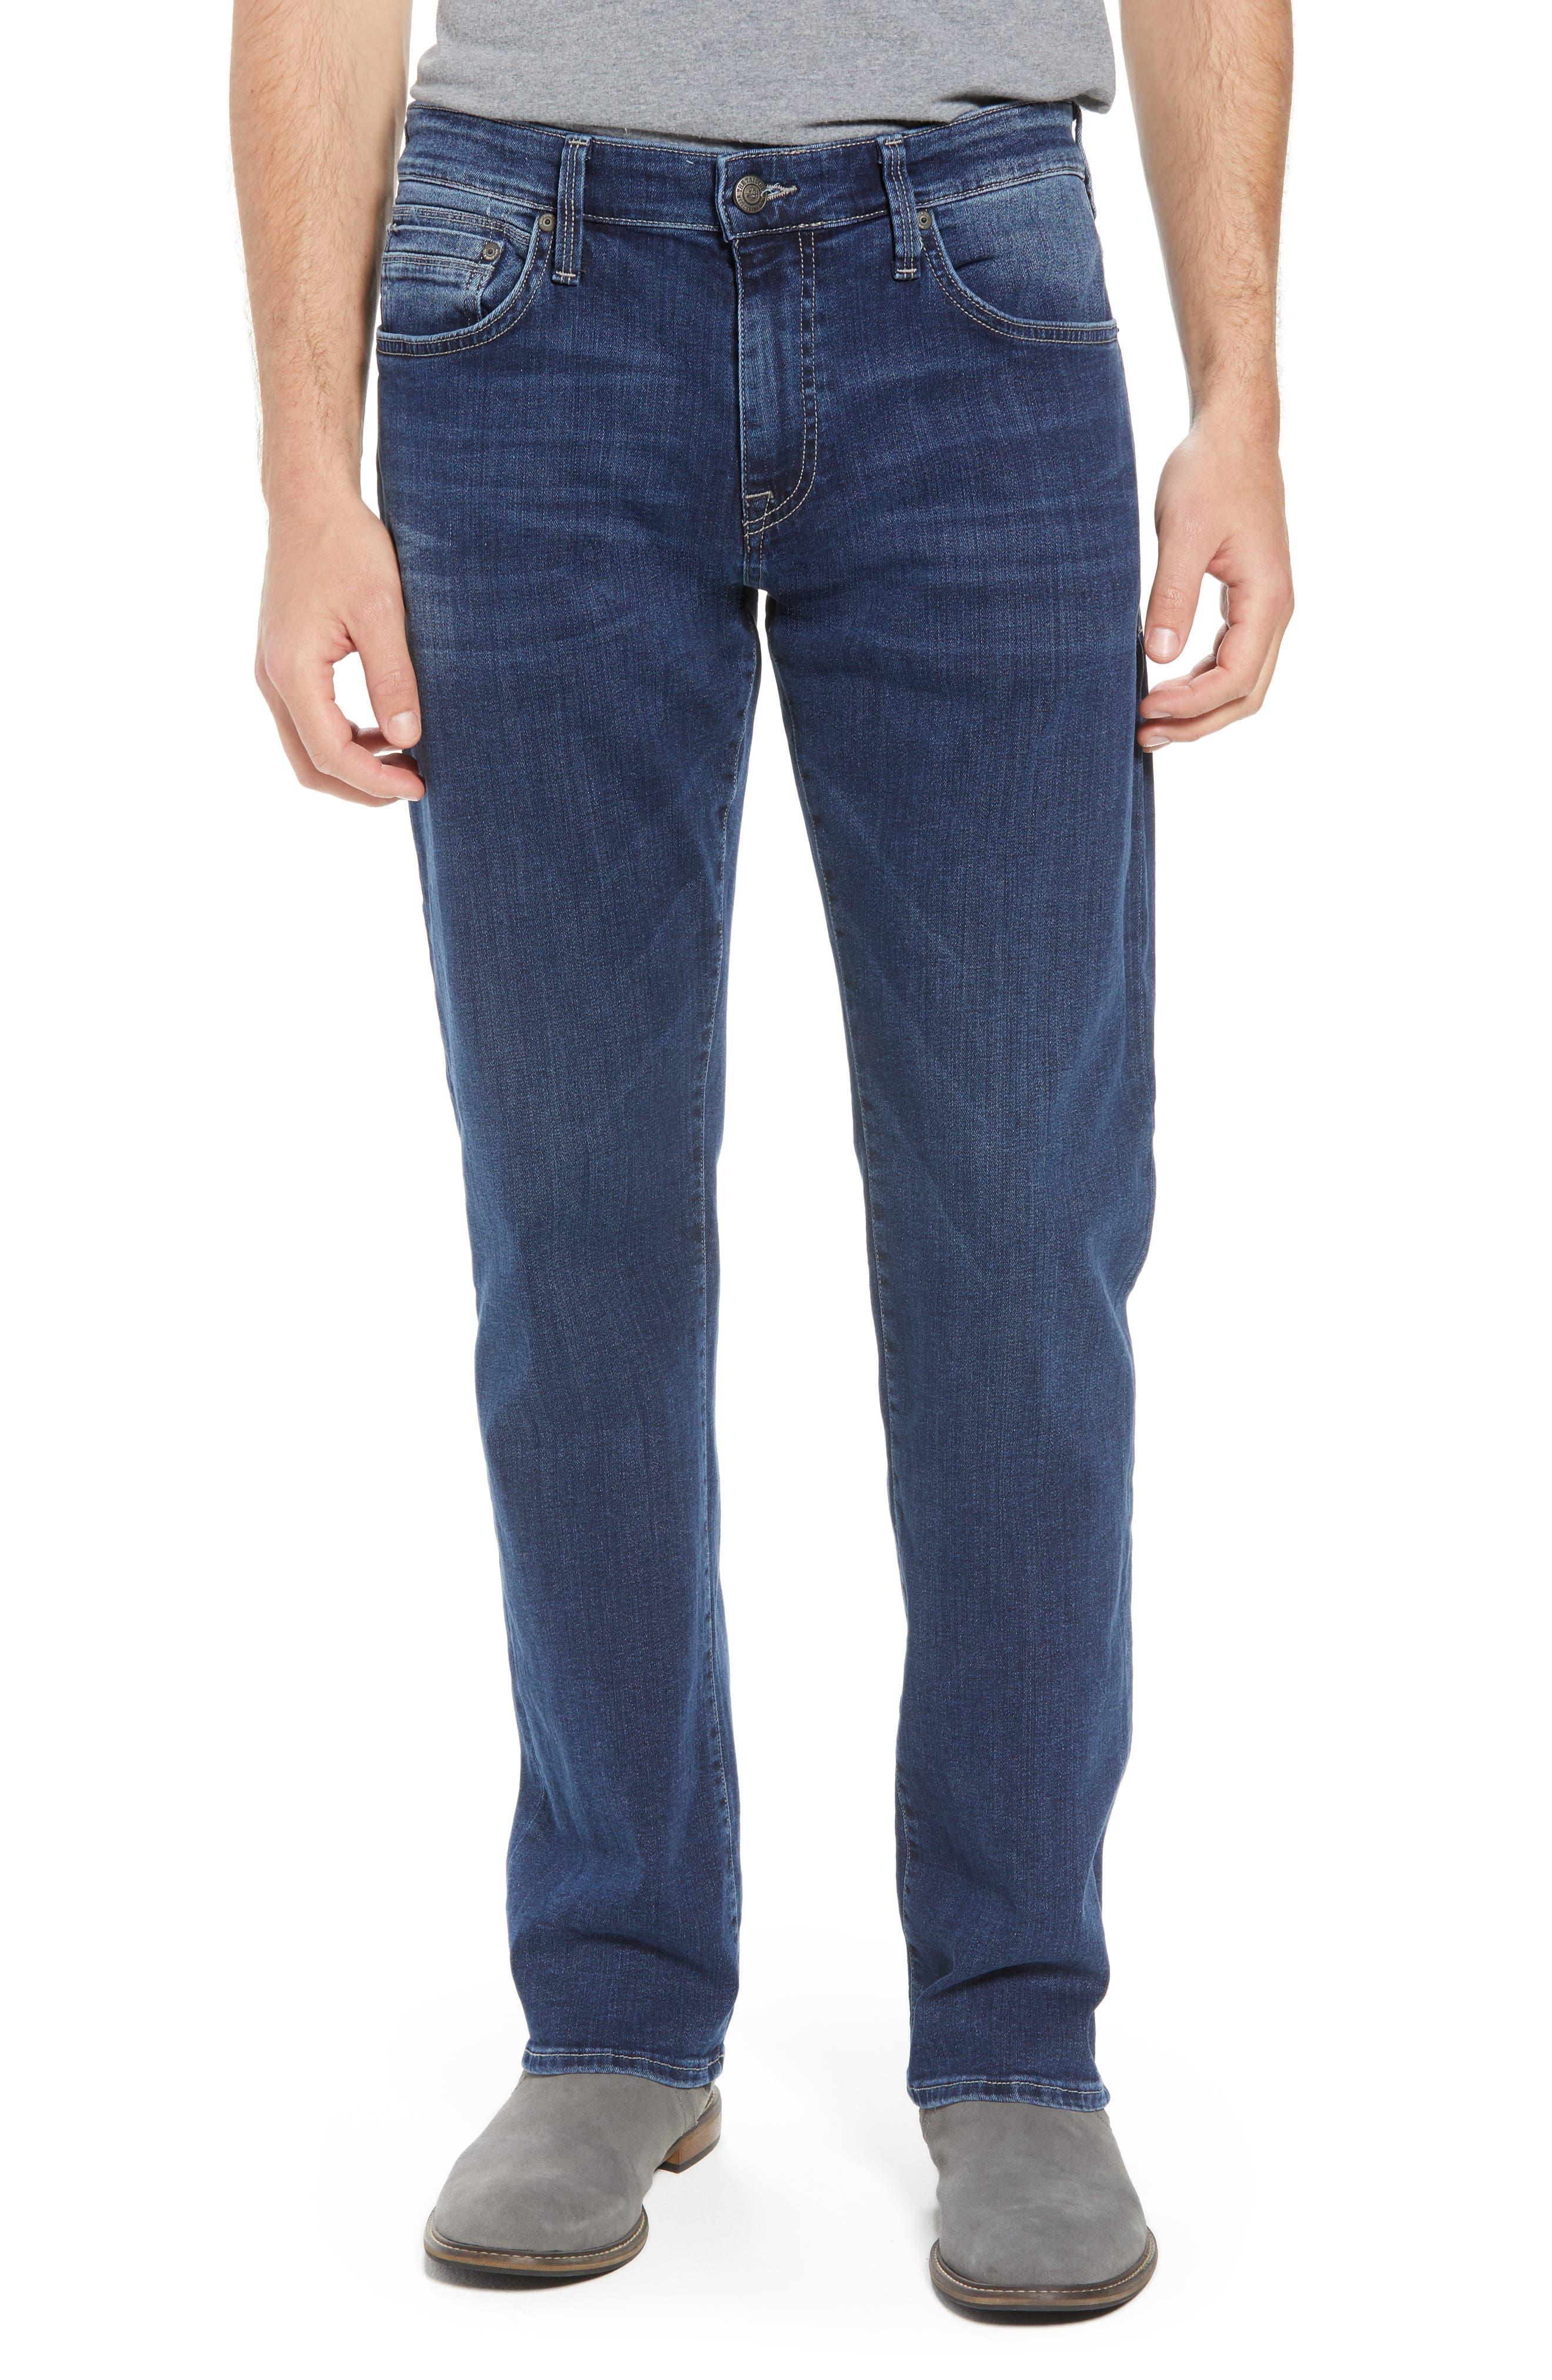 Zach Straight Leg Jeans,                         Main,                         color, Dark Blue Williamsburg